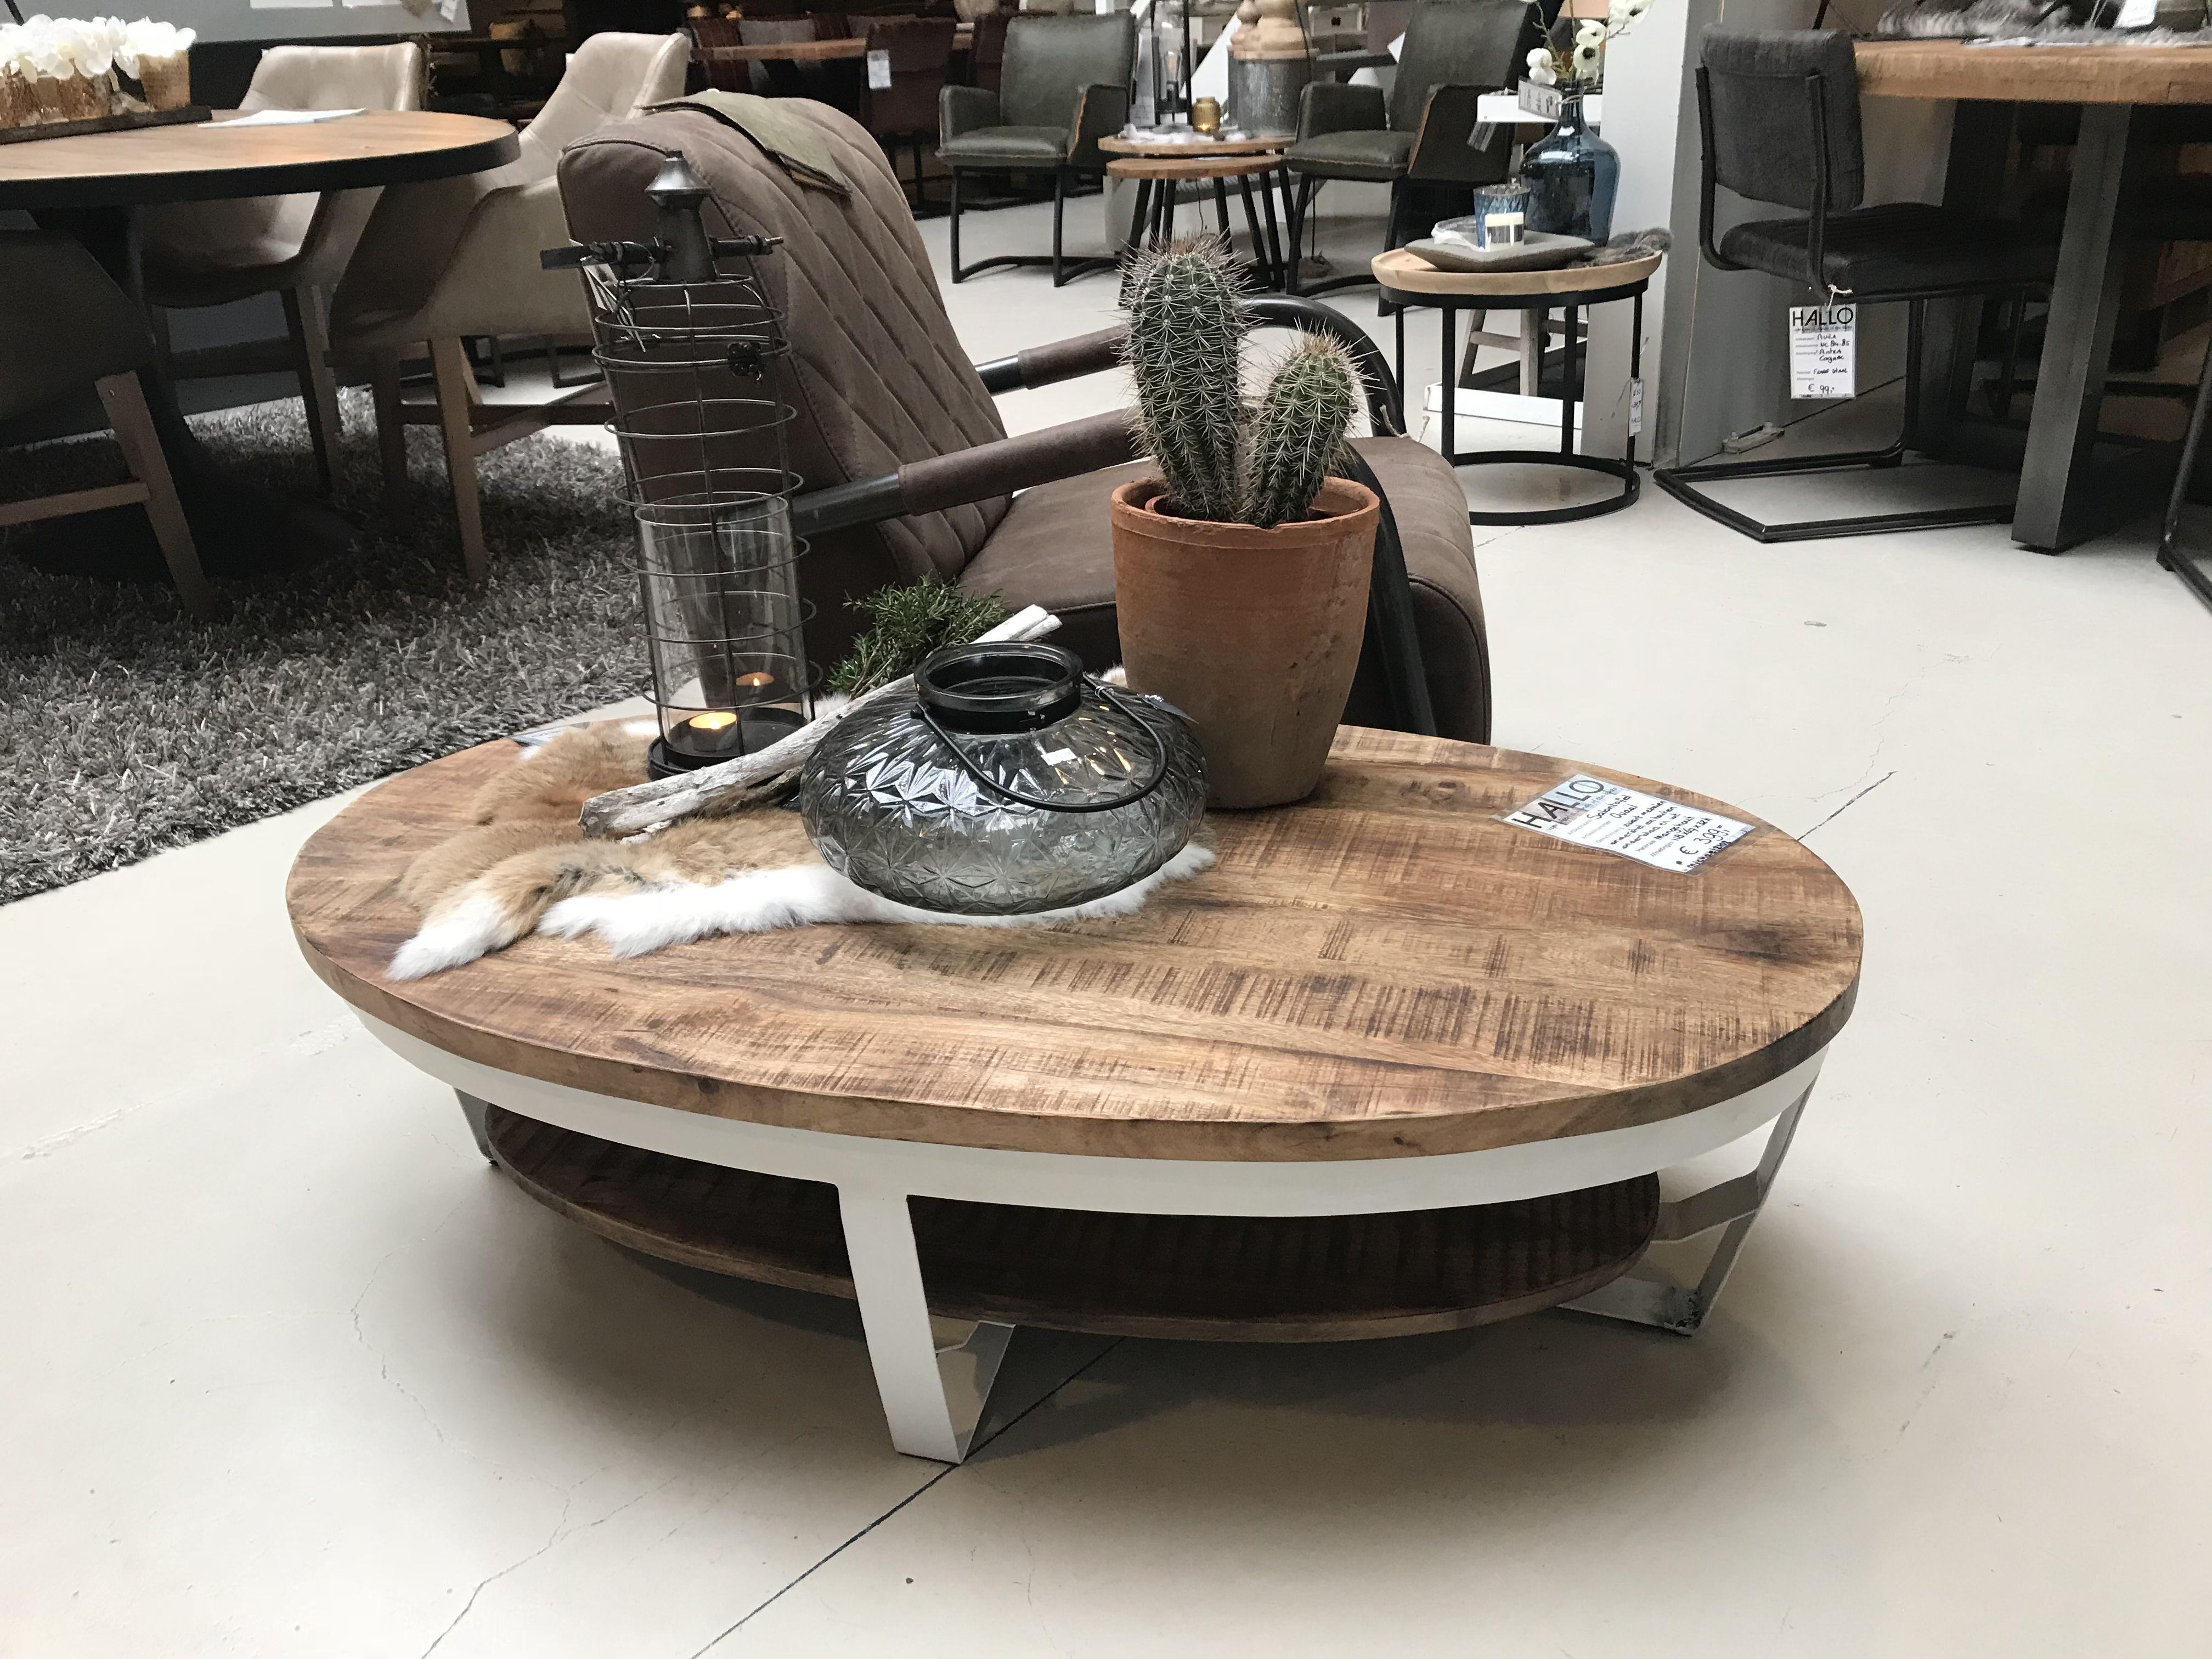 Houten Salon Tafel : Salontafel ovaal industrieel speciaal deze salontafel met